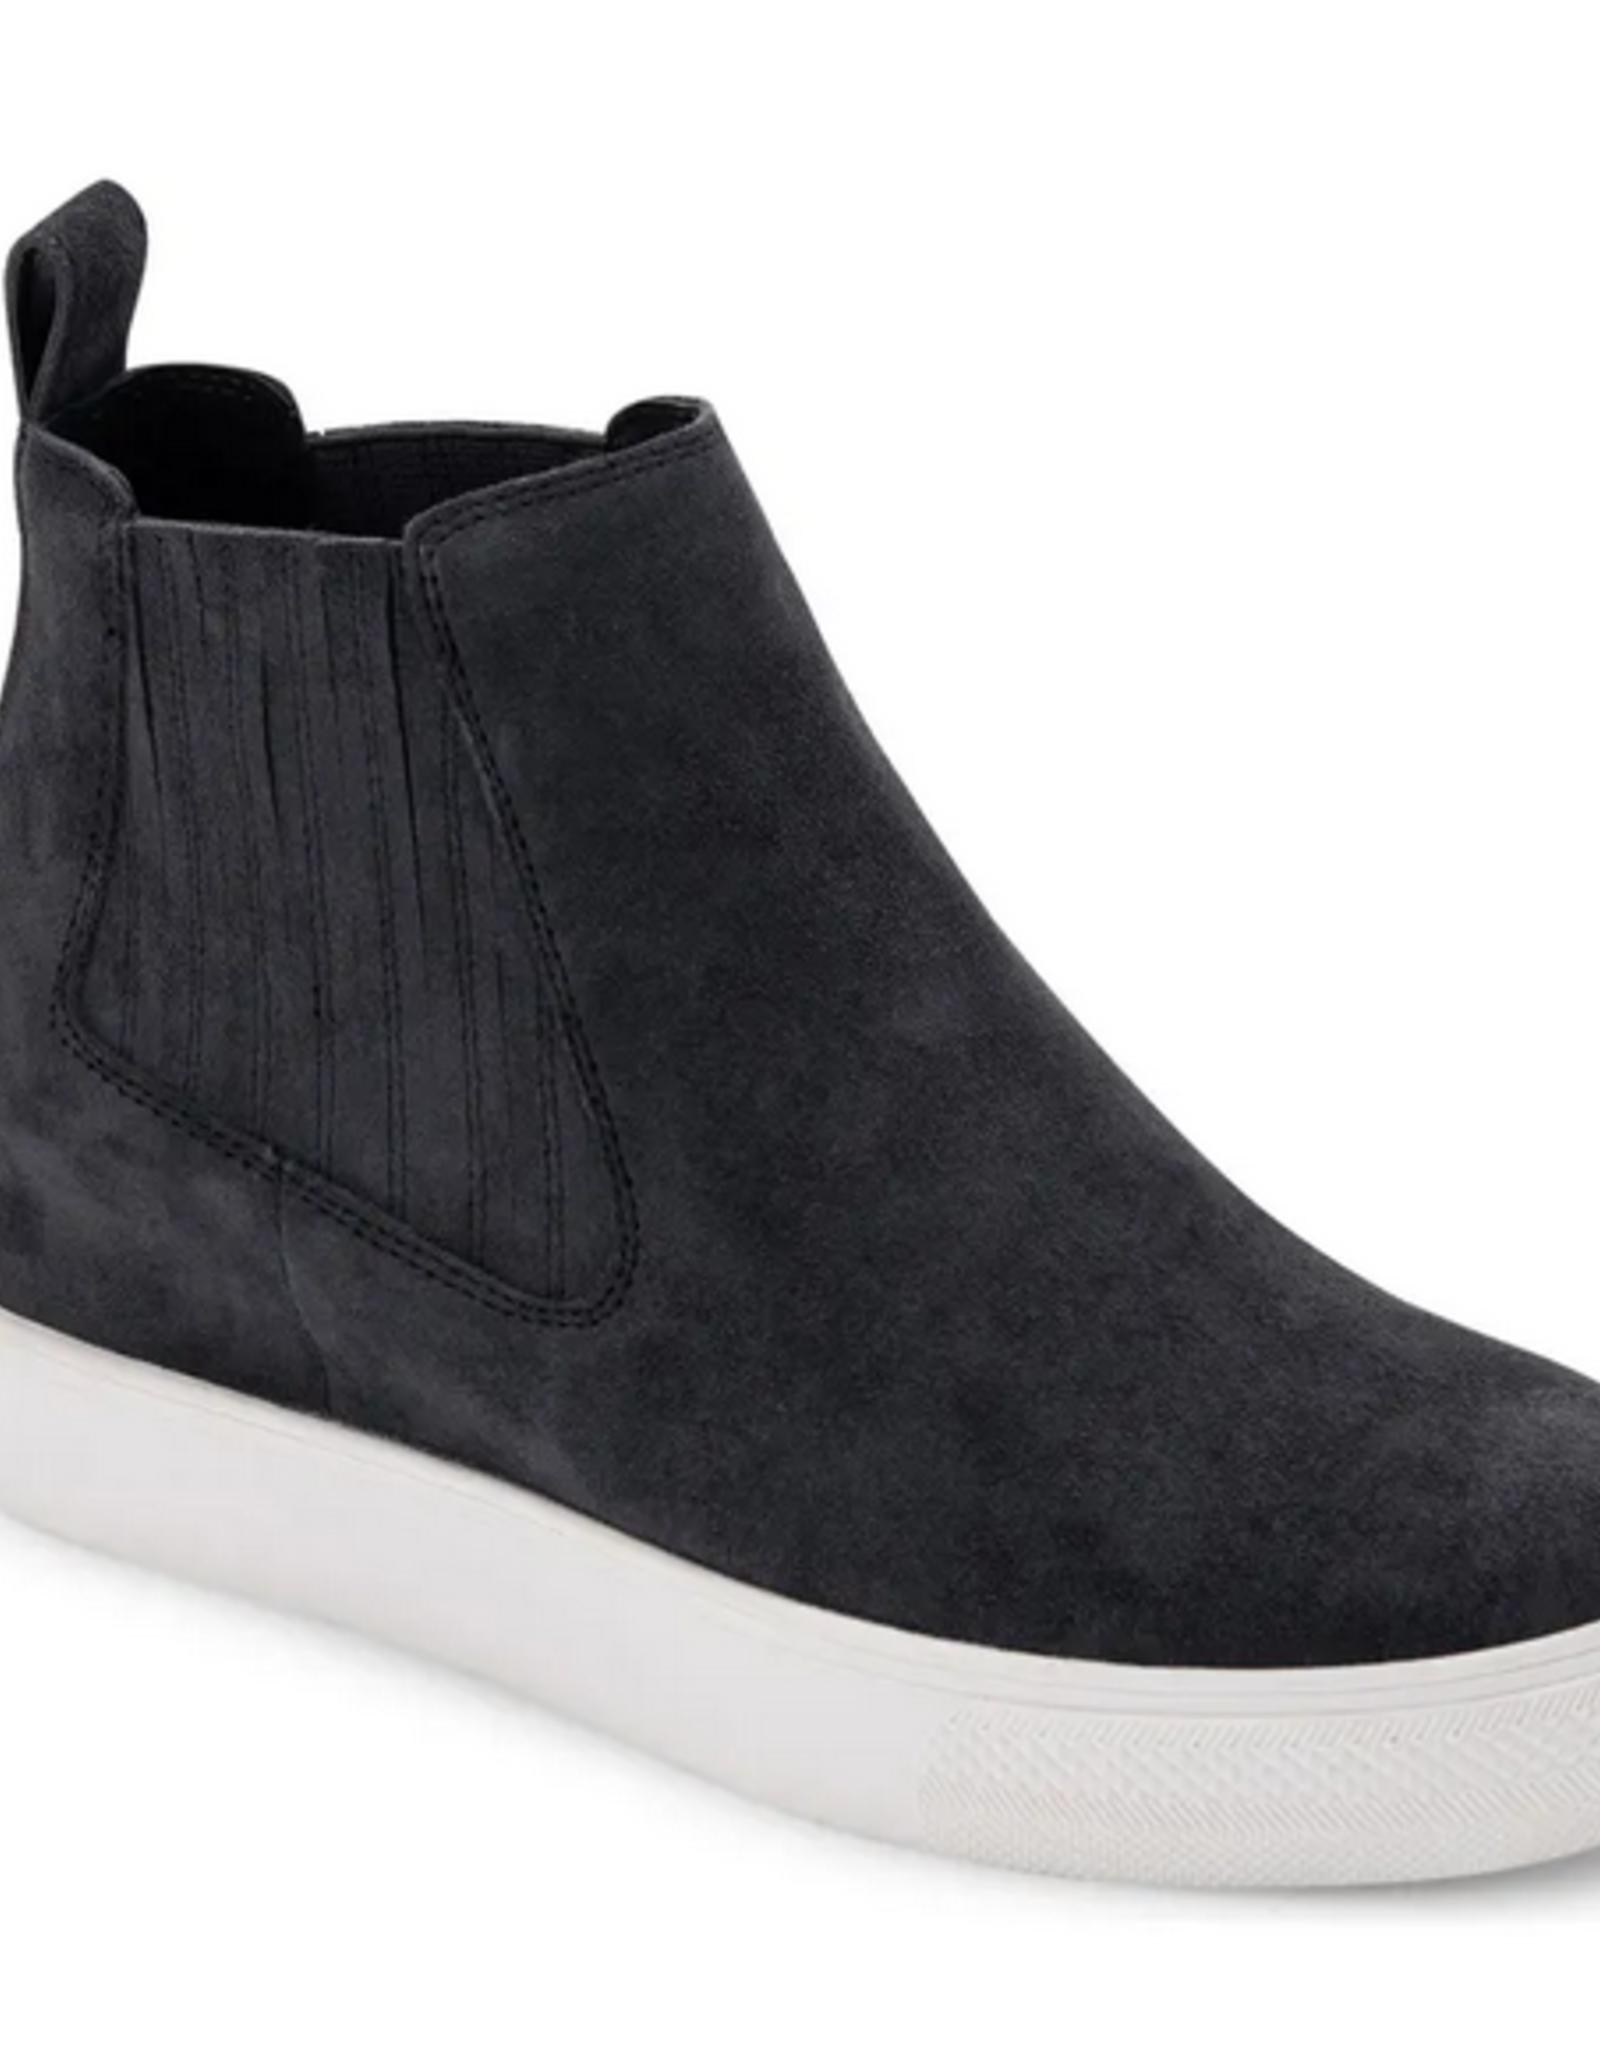 Dolce Vita Wynd Suede Sneaker